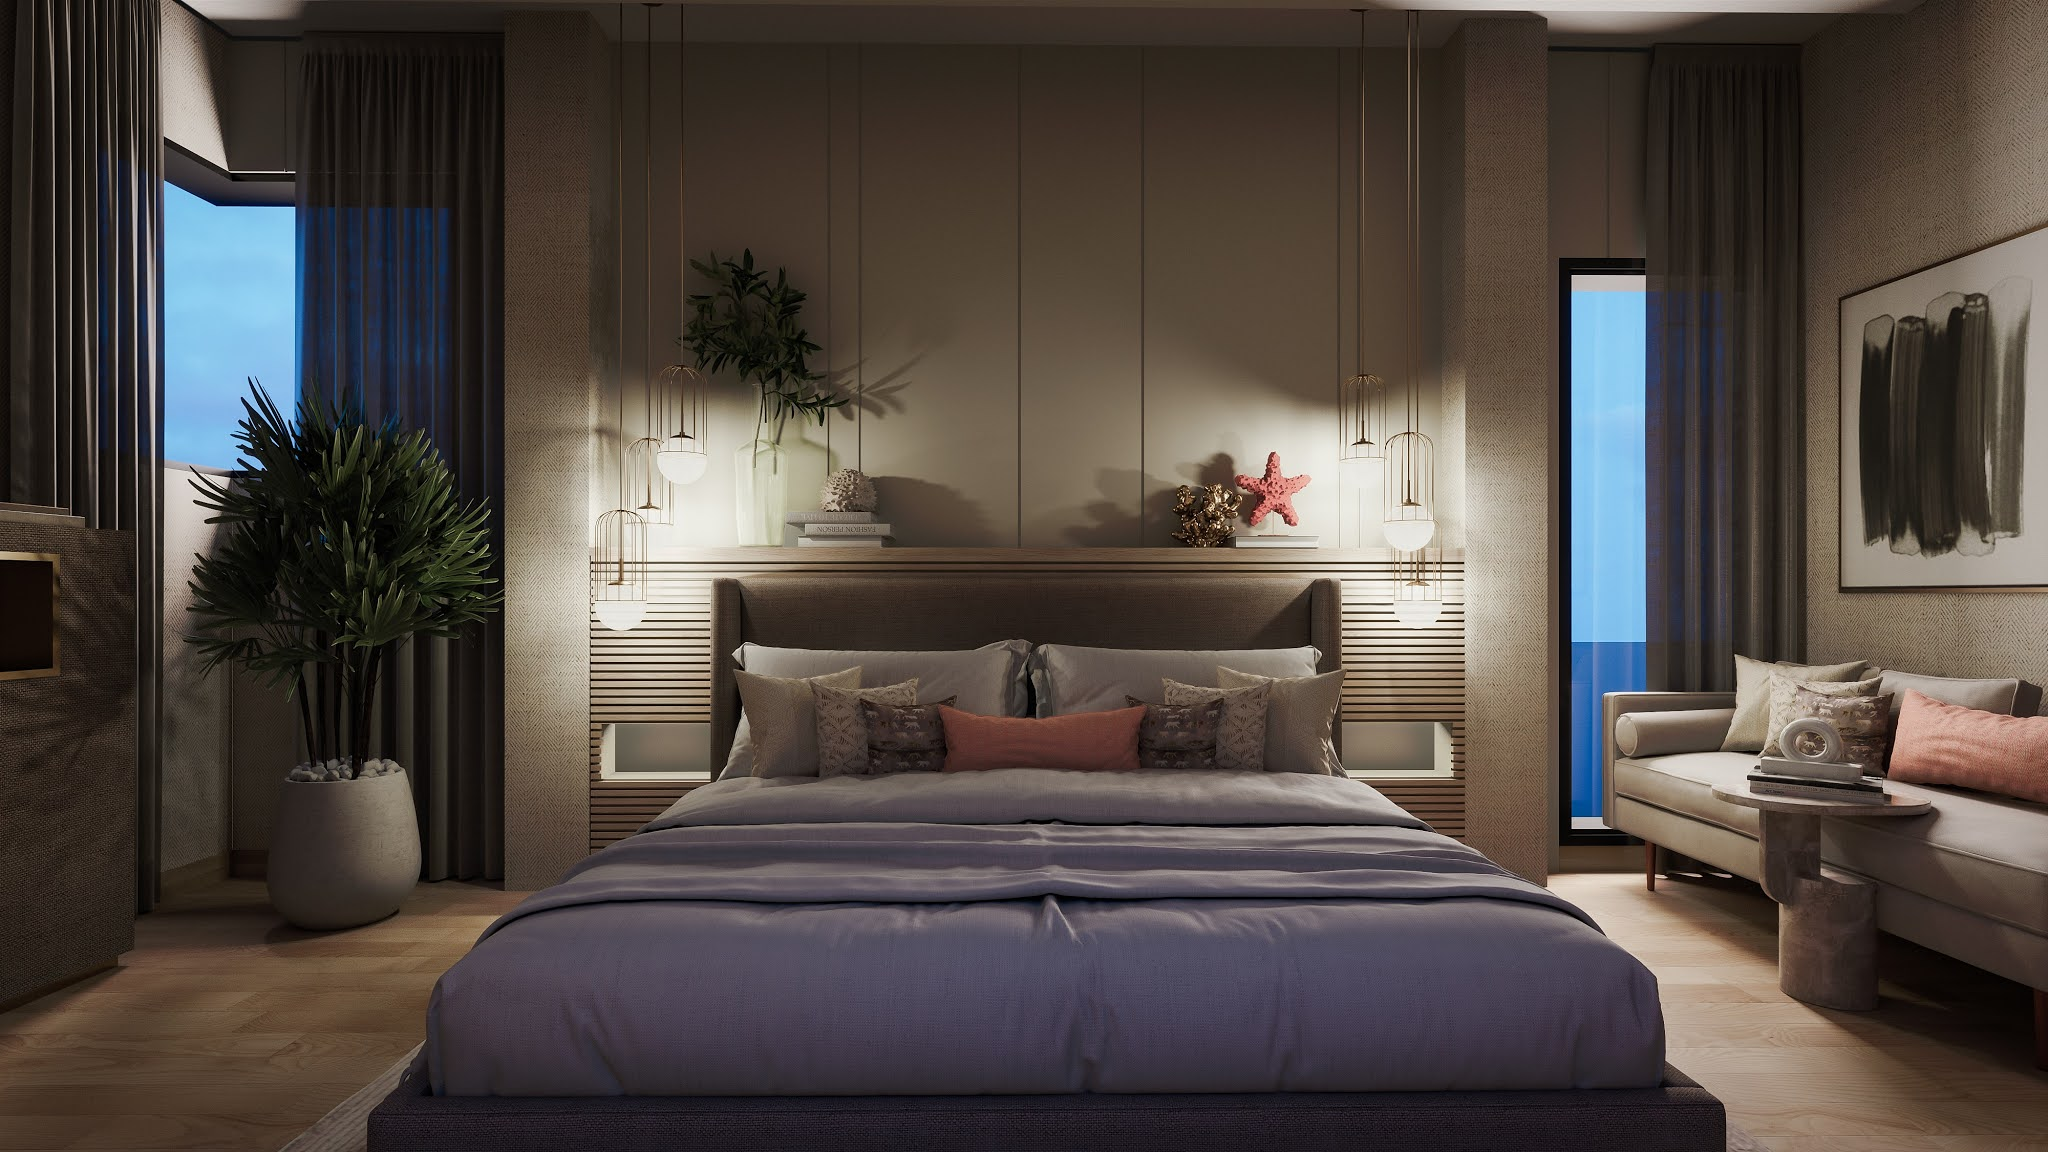 desain interior kamar tidur utama ukuran